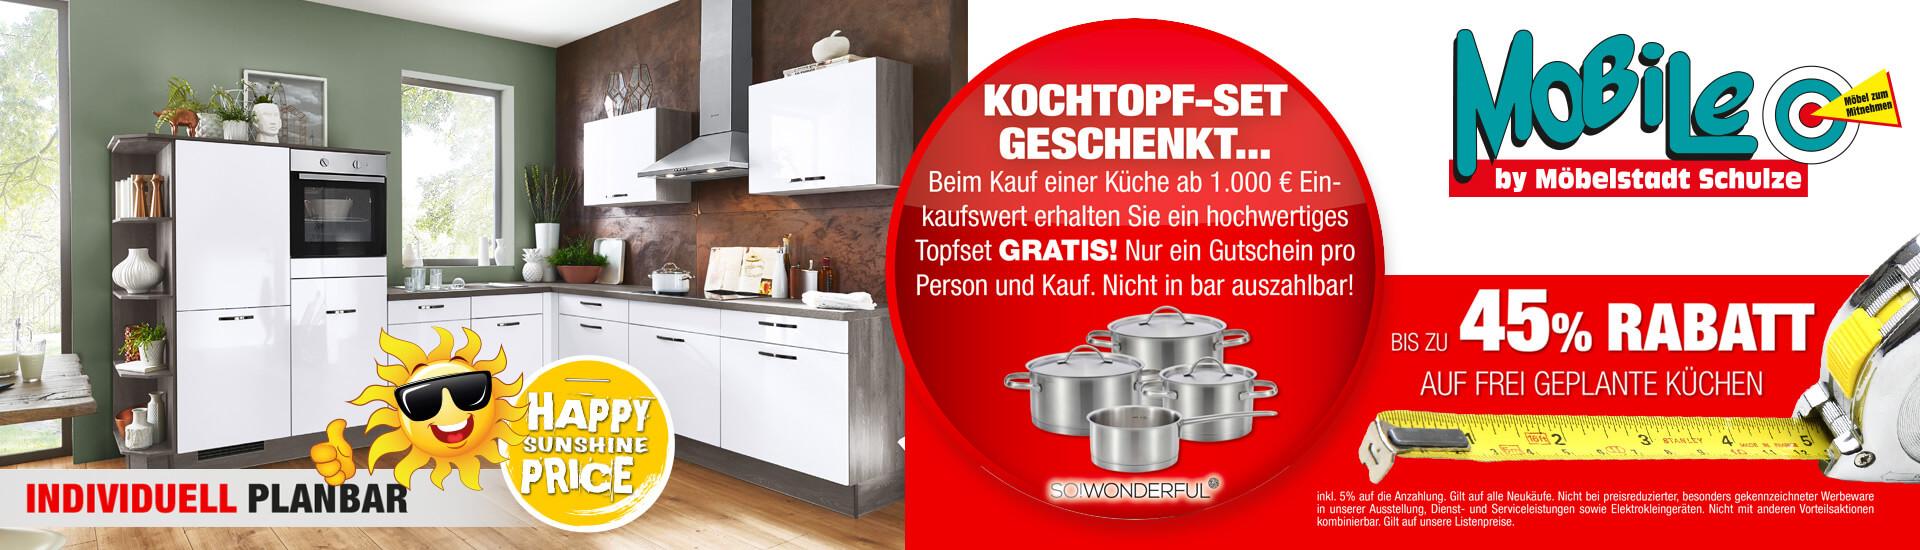 Küchenaktion im Mobile | Rödental